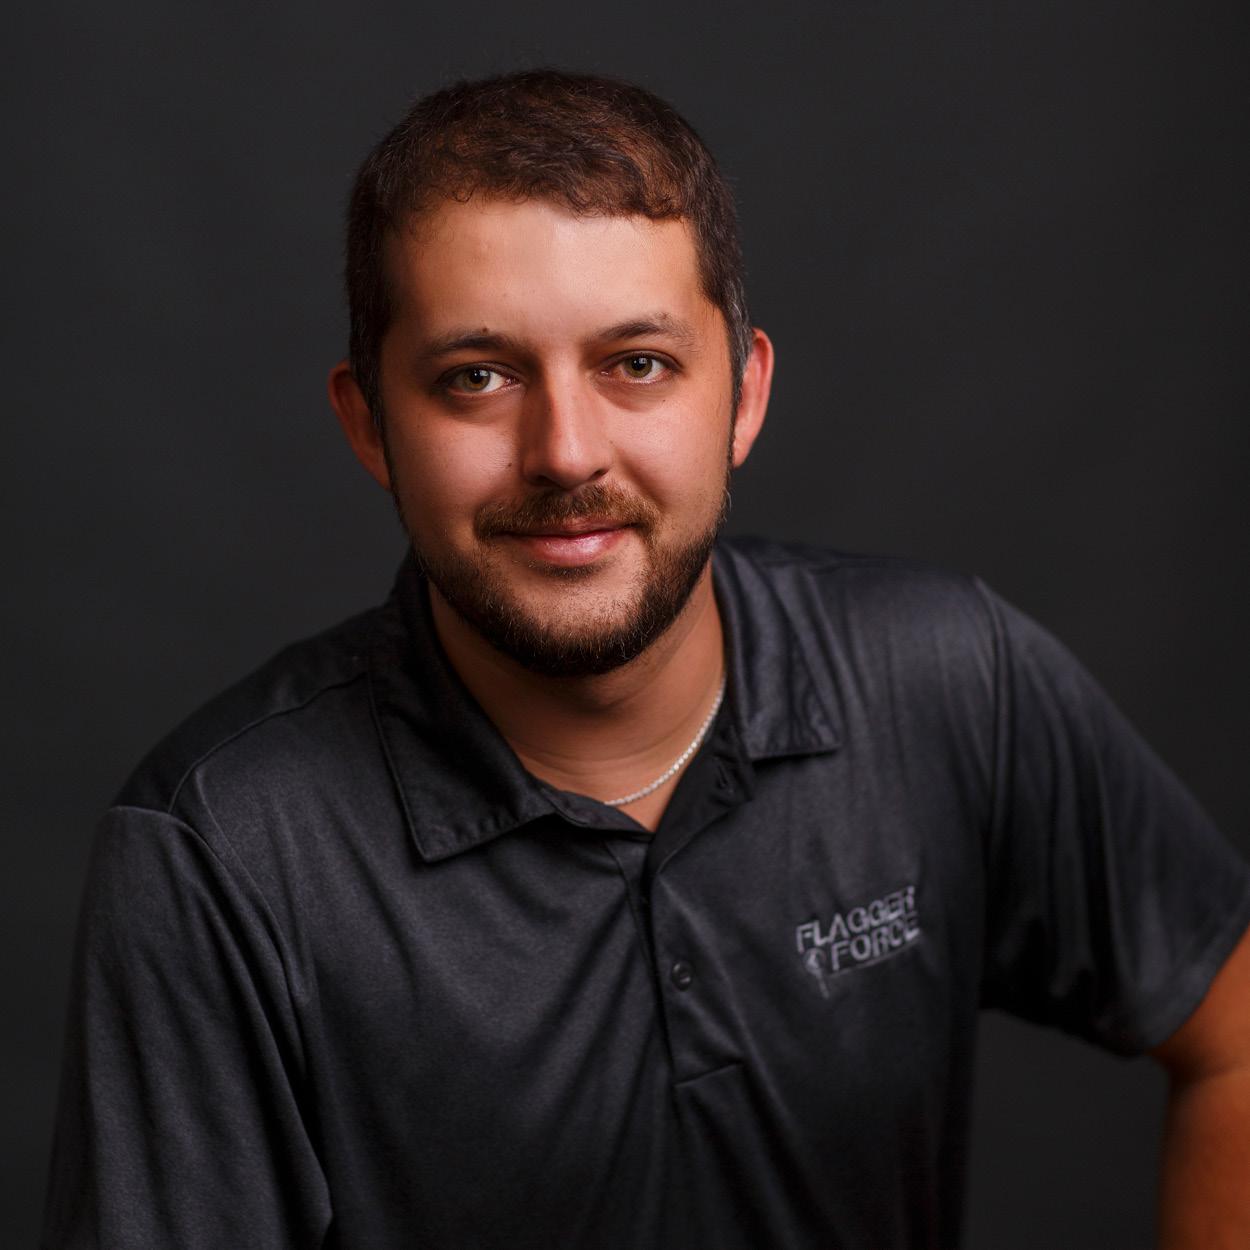 Employee Spotlight with Tyler Orazio